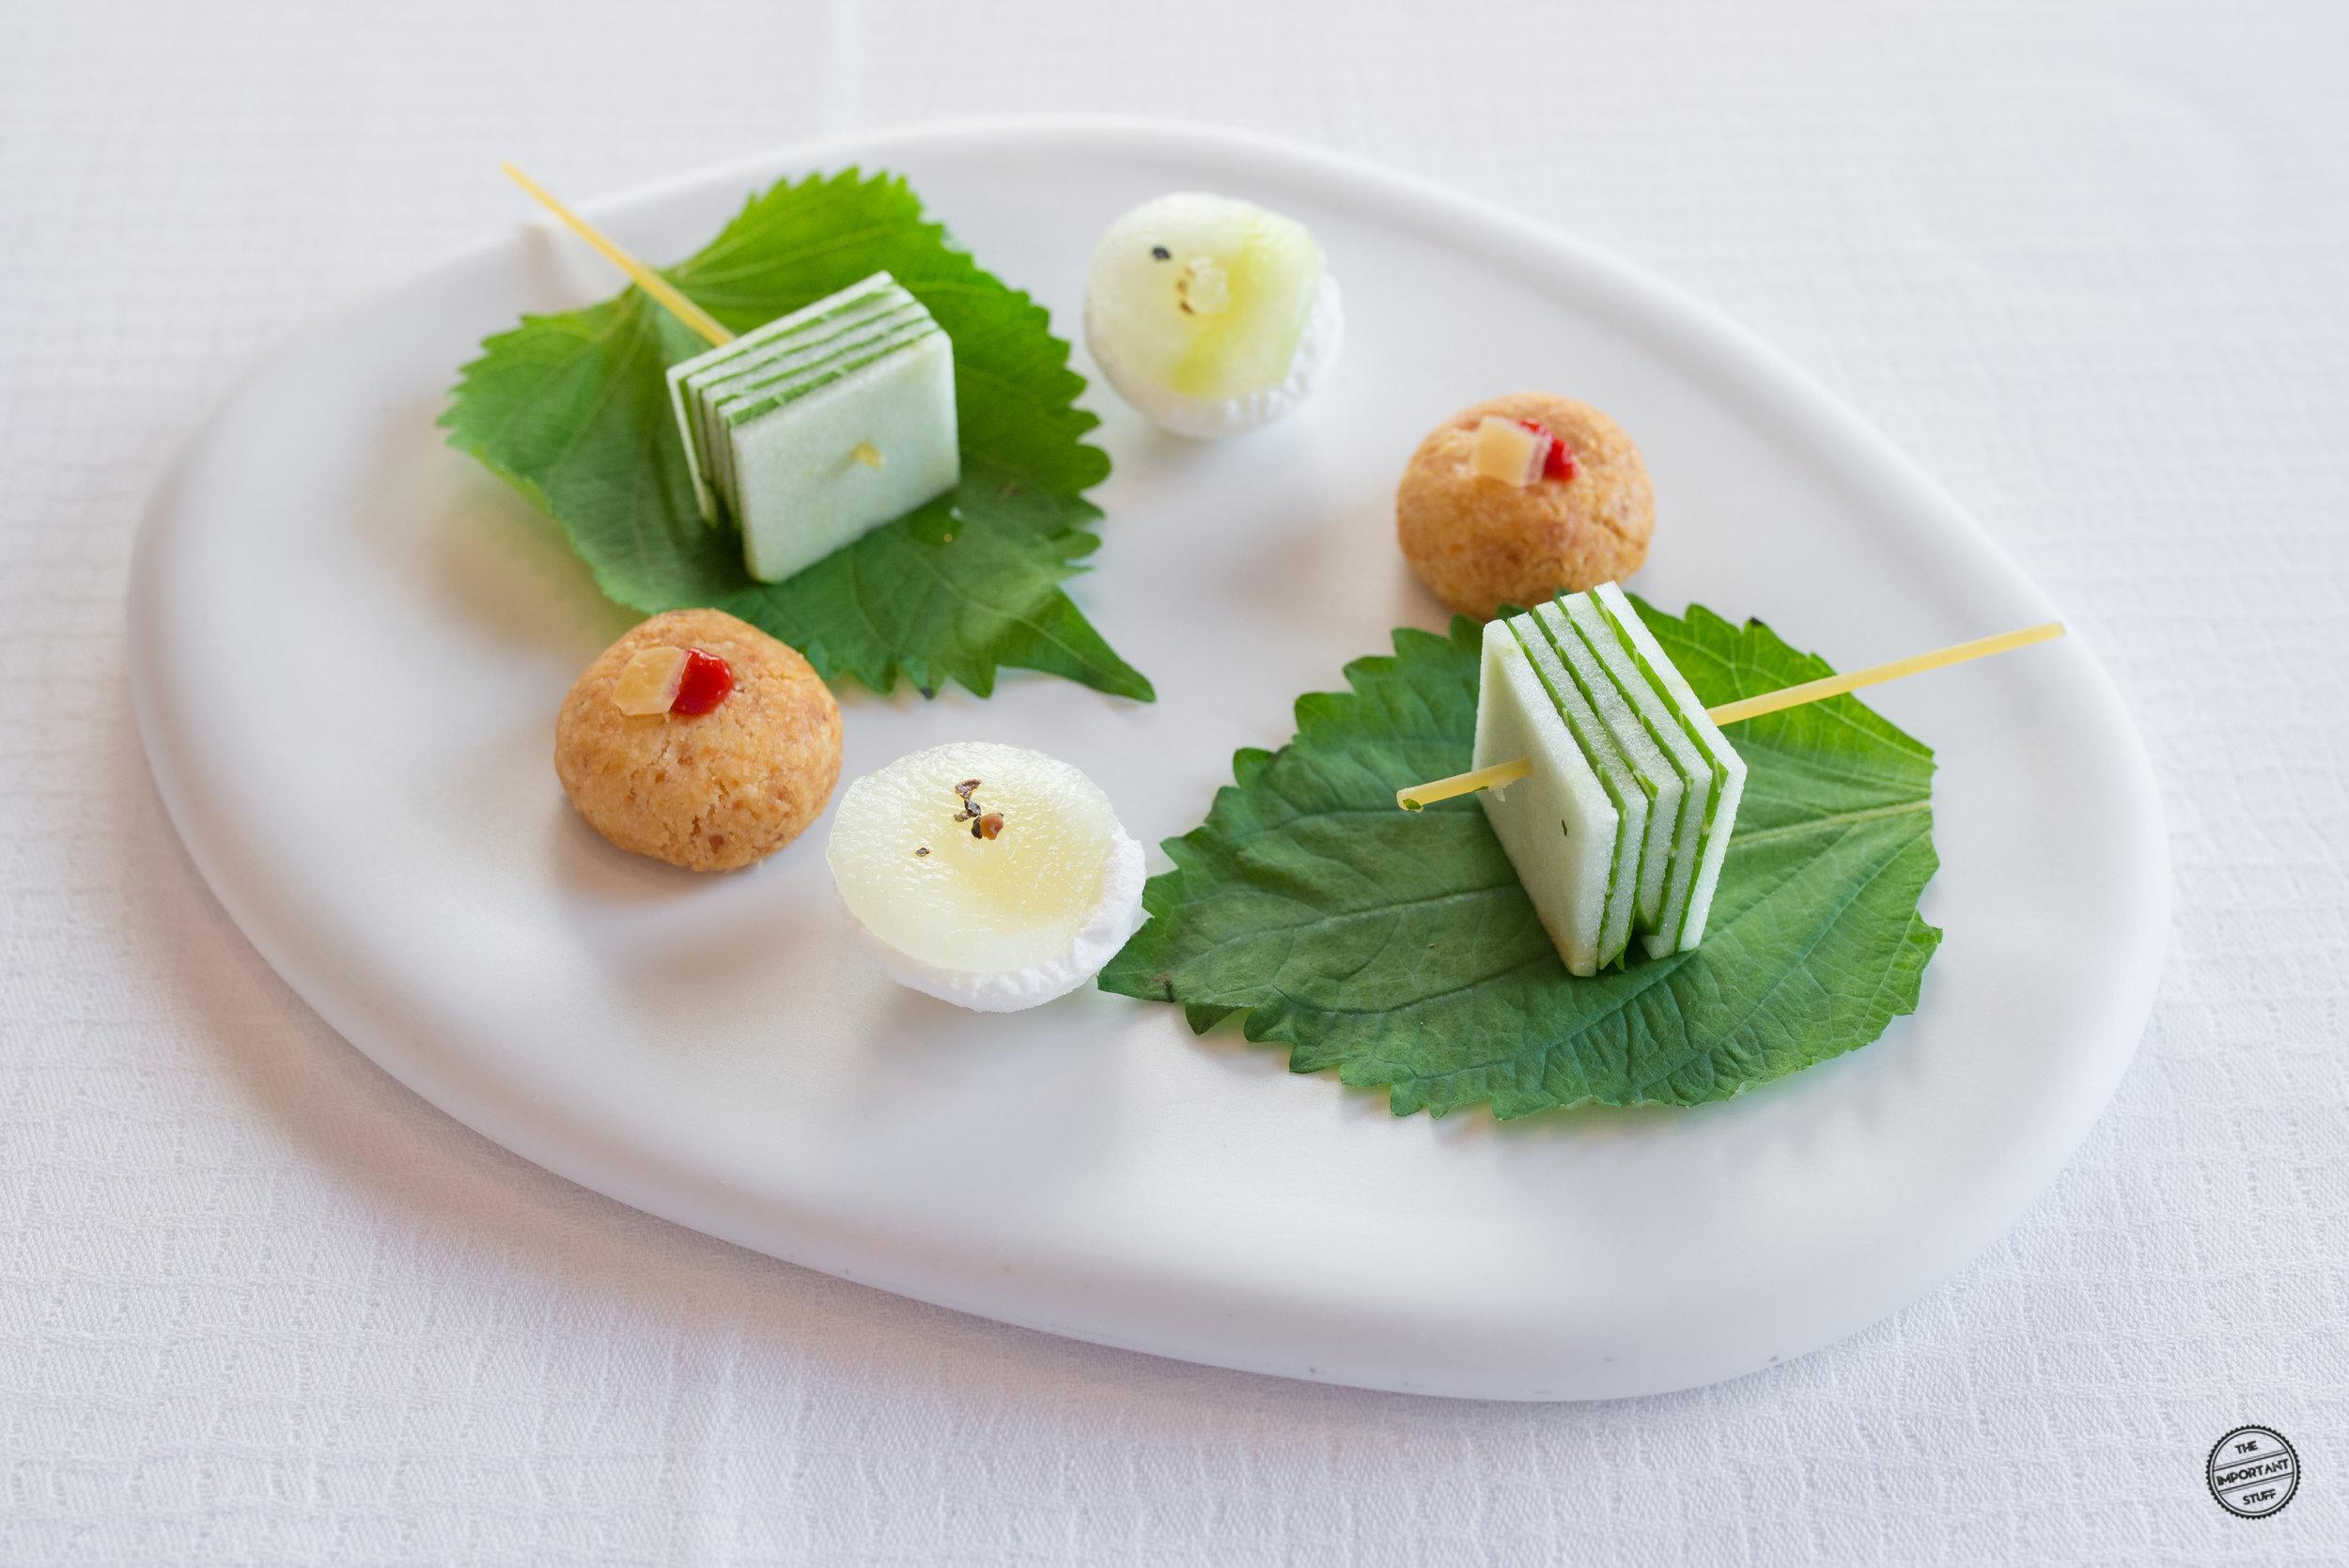 pierre_gagnaire_hongkong_snacks